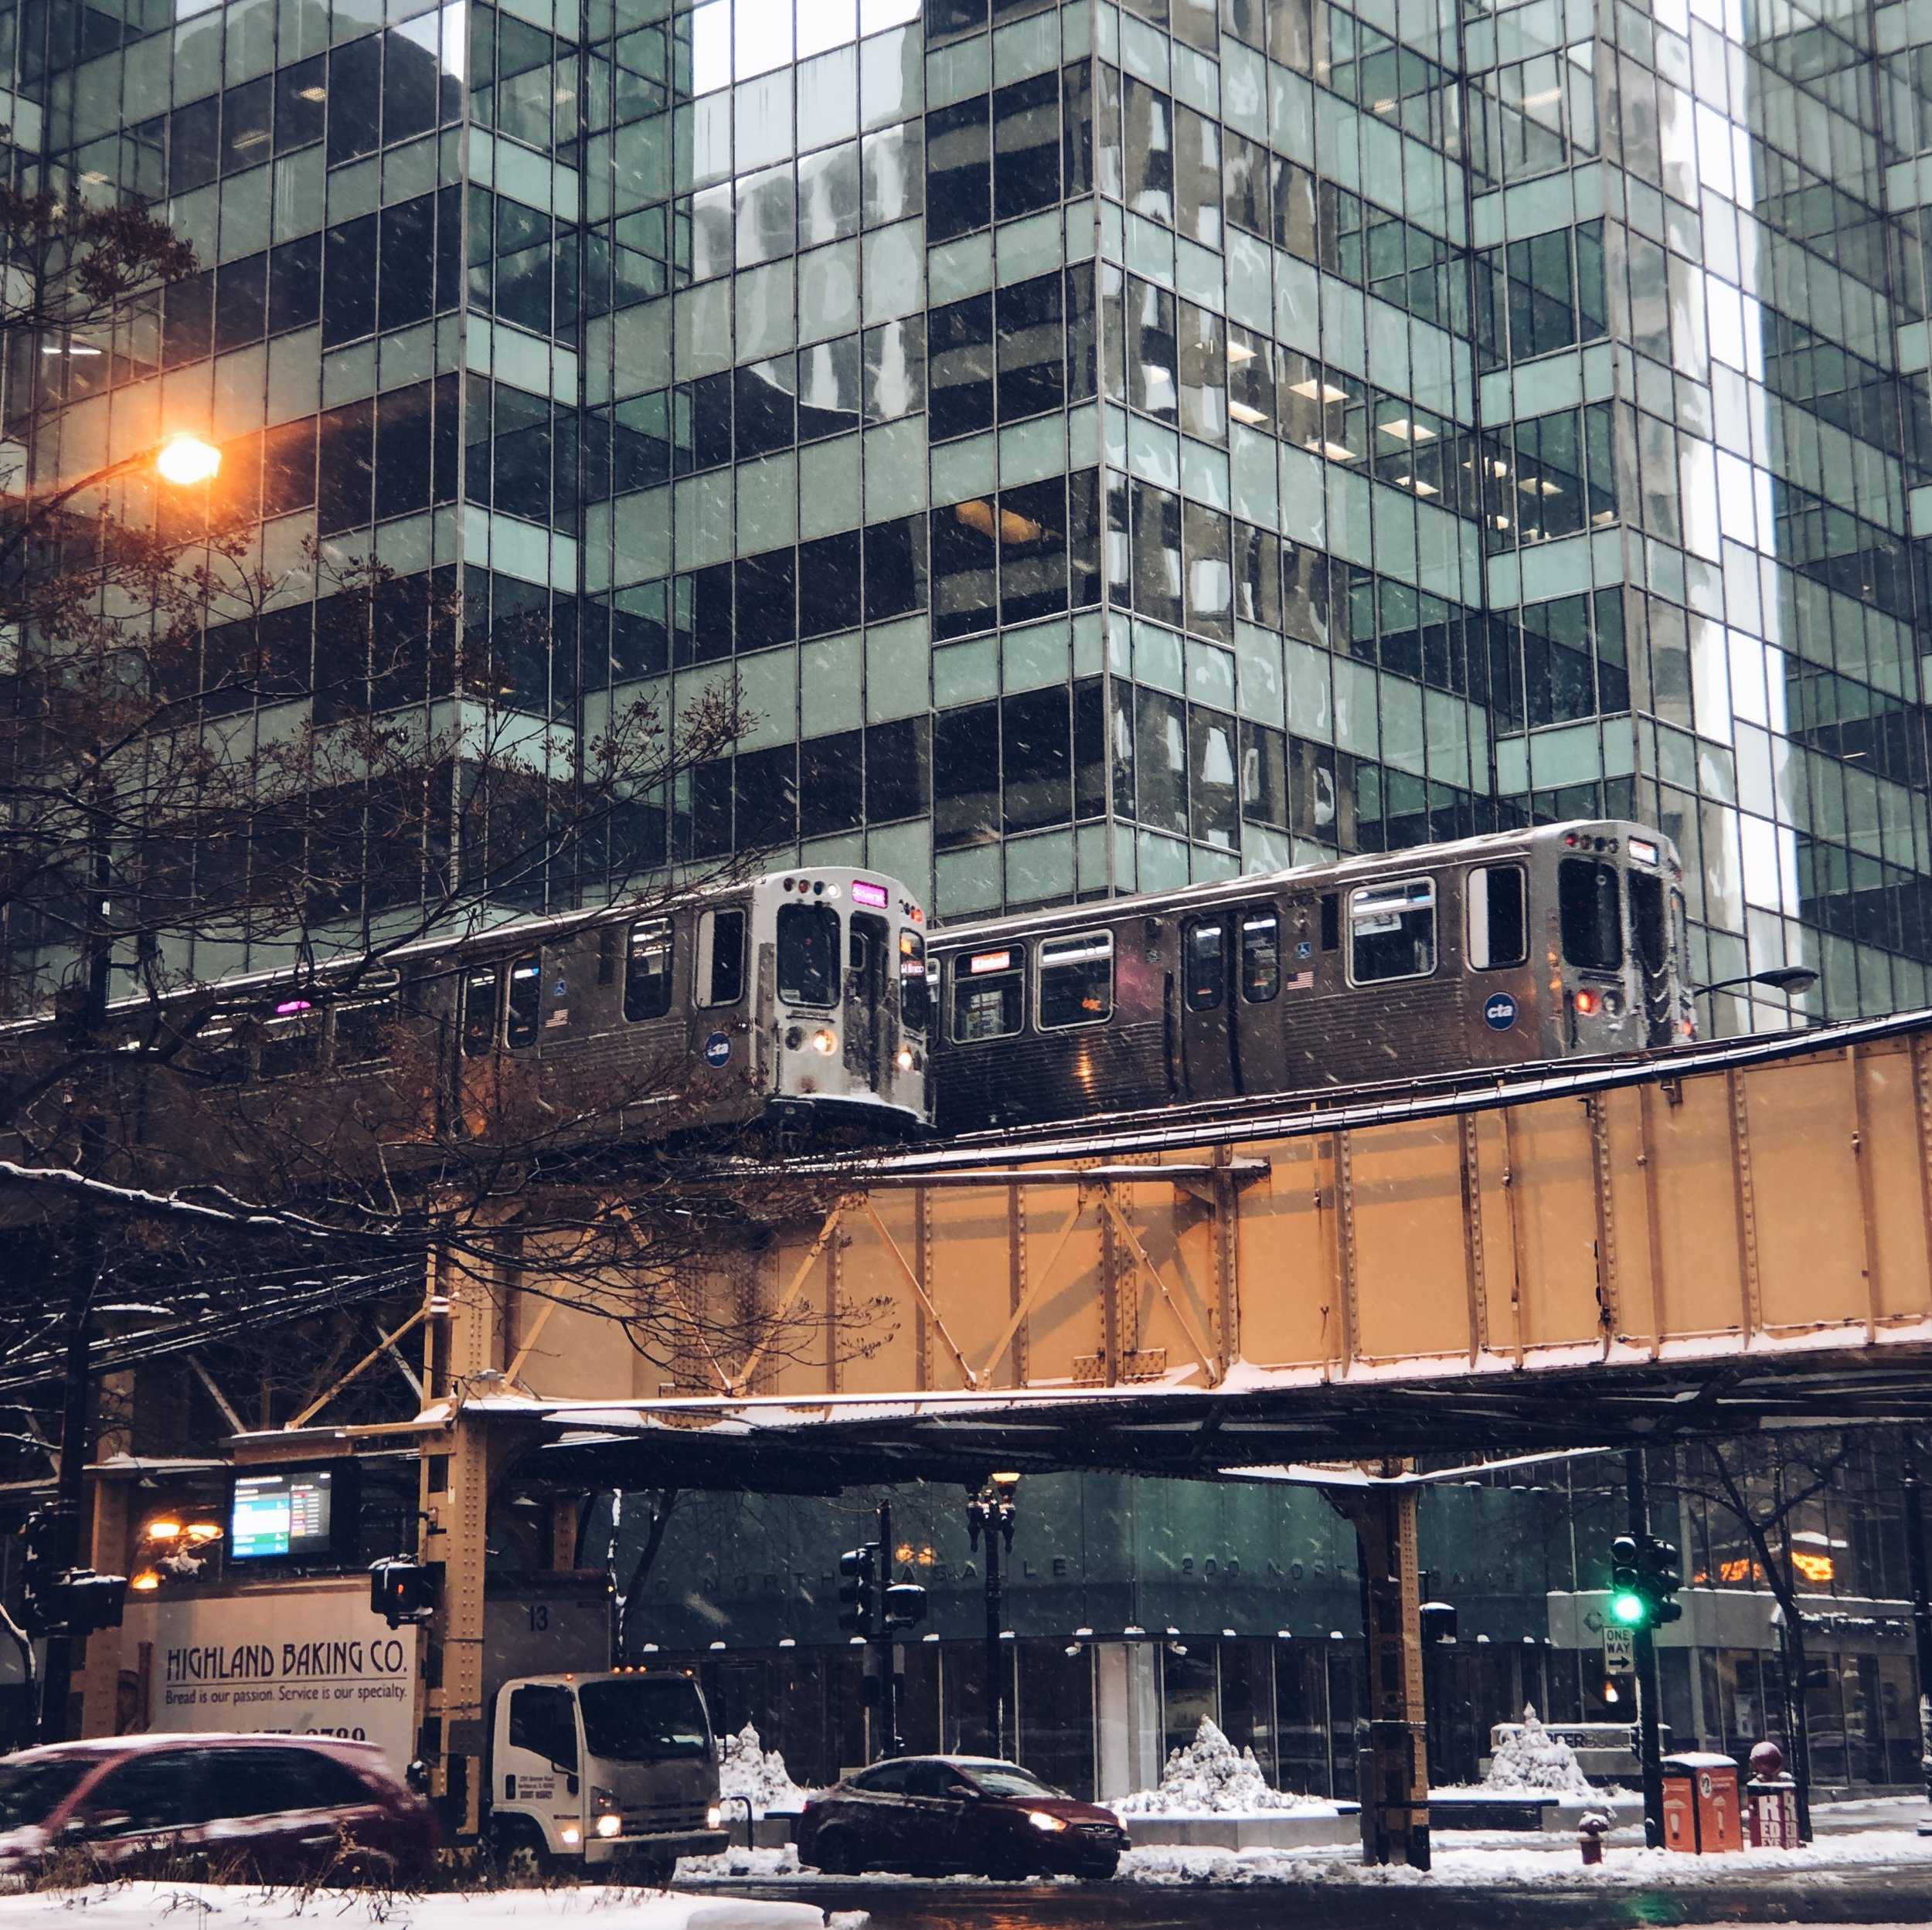 chicago-snow-kourtney-murray-04.jpg